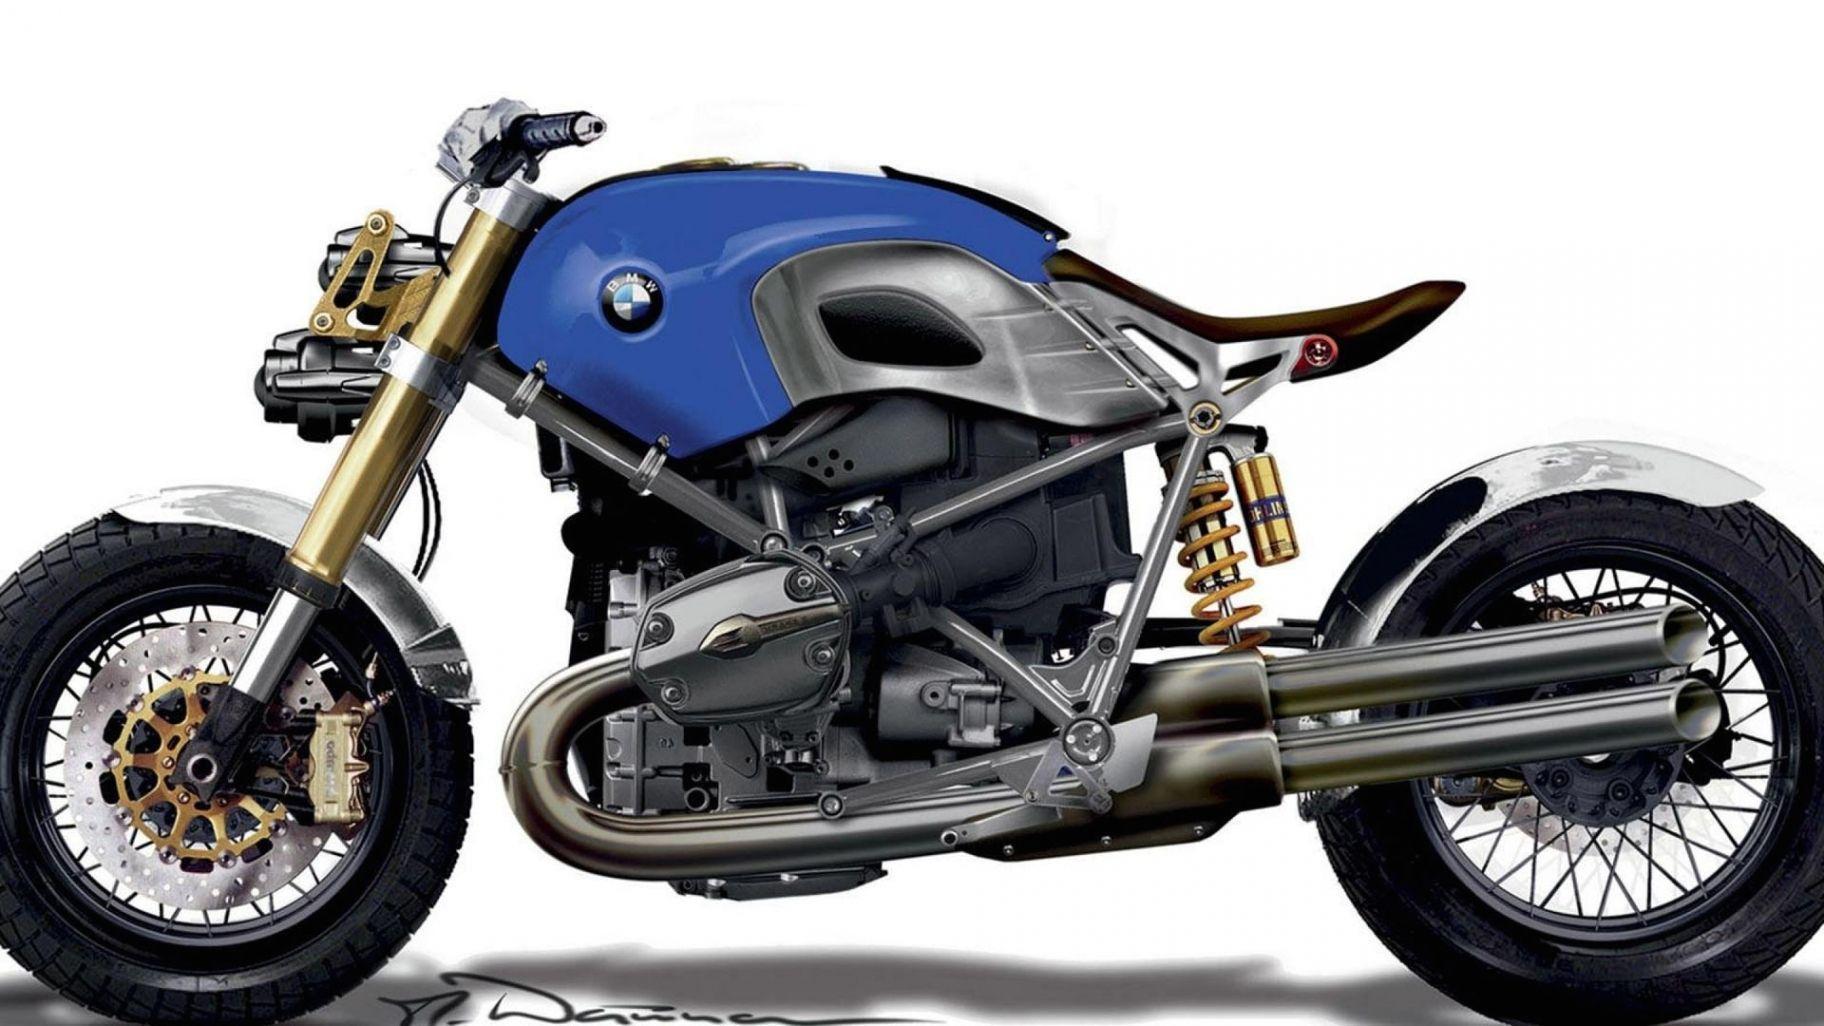 BMW Bikes Wallpapers - Wallpaper Cave